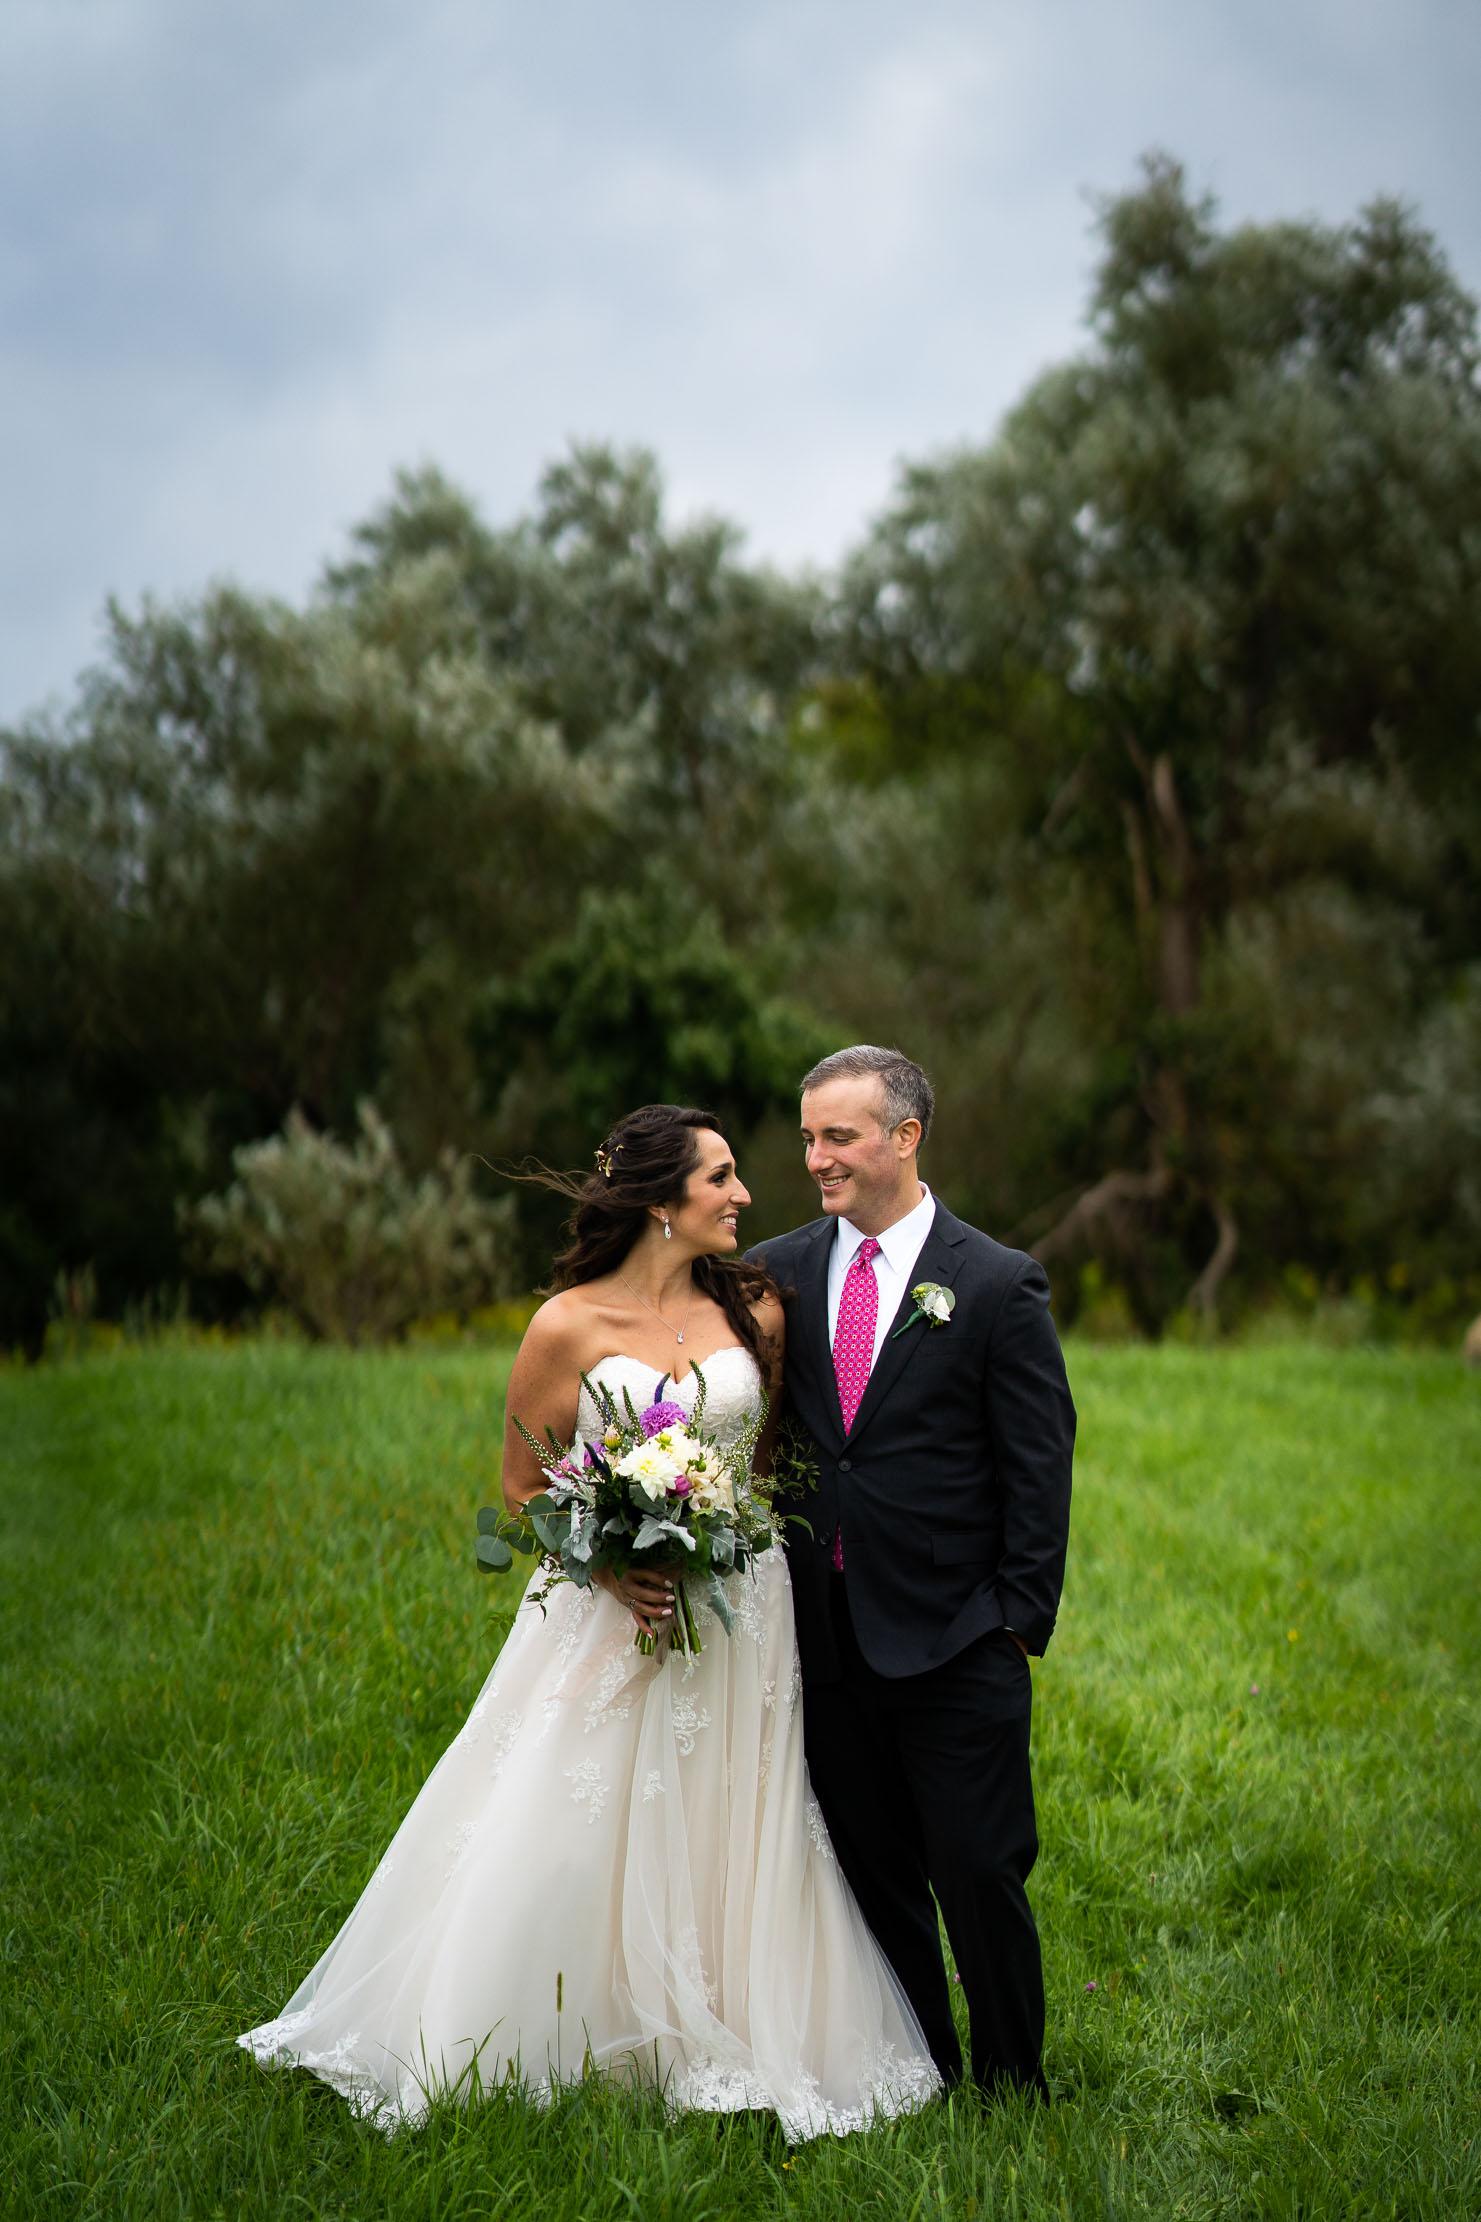 Wings-Castle-Millbrook-NY-Upstate-Wedding-Photographer-1056.jpg